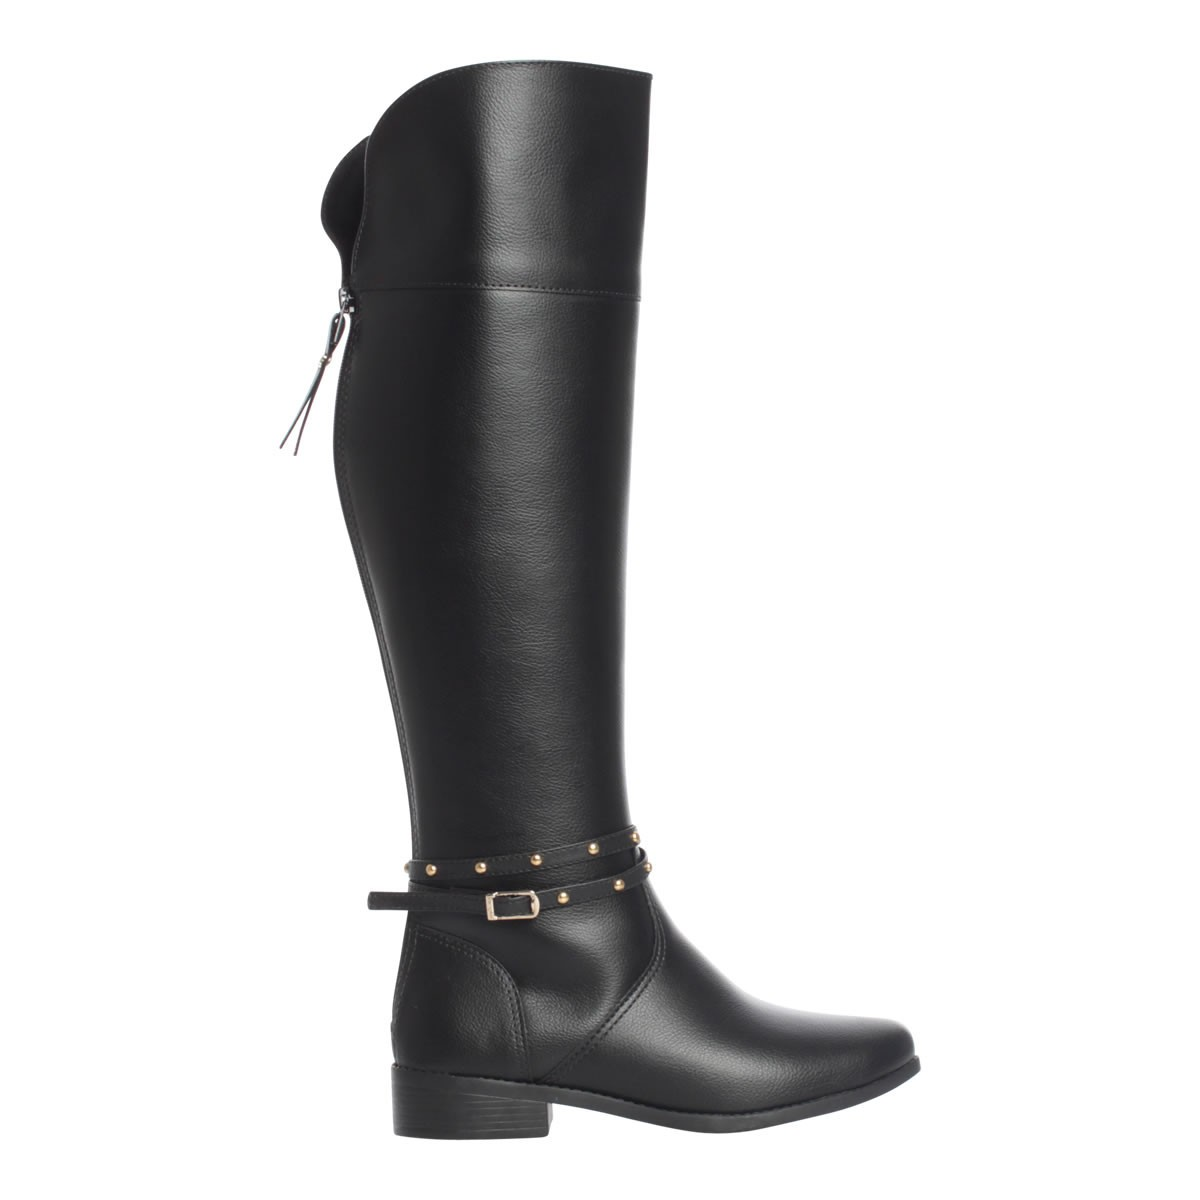 6f2f3f01a Bizz Store - Bota Over The Knee Infantil Menina Pampili Safira